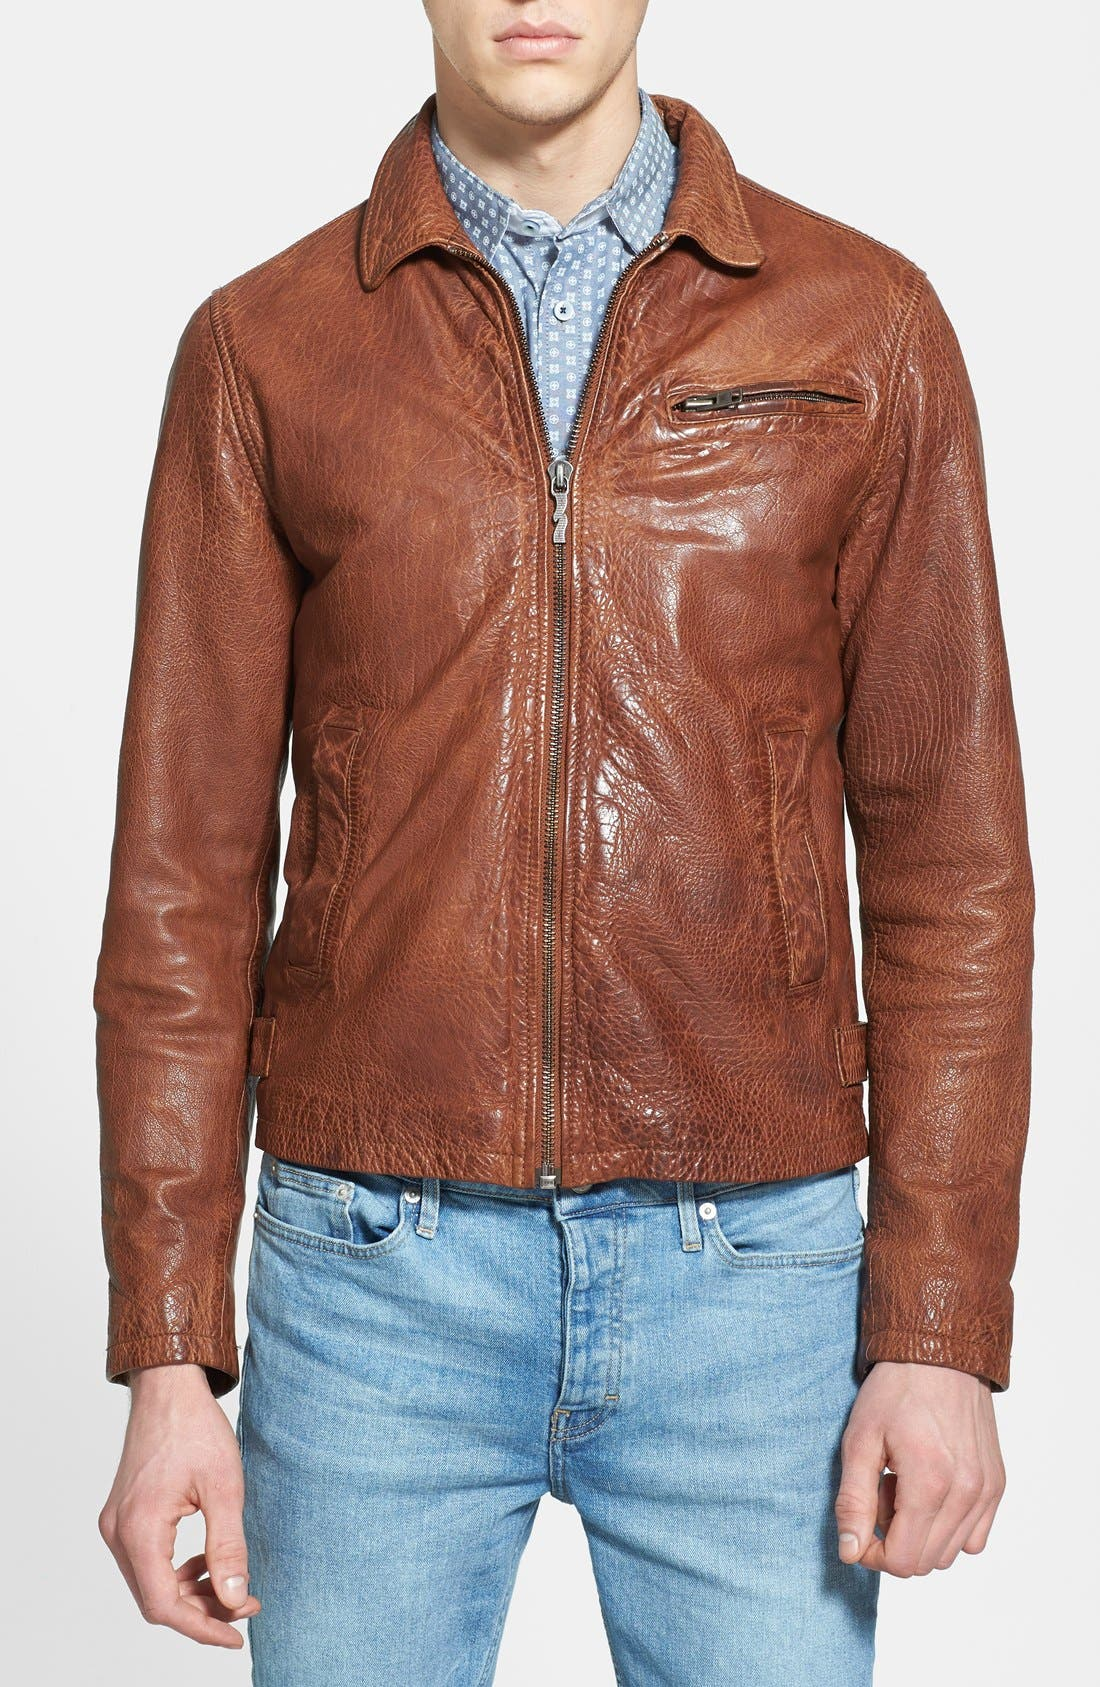 Alternate Image 1 Selected - Nudie Jeans 'Ervin '50s' Leather Jacket